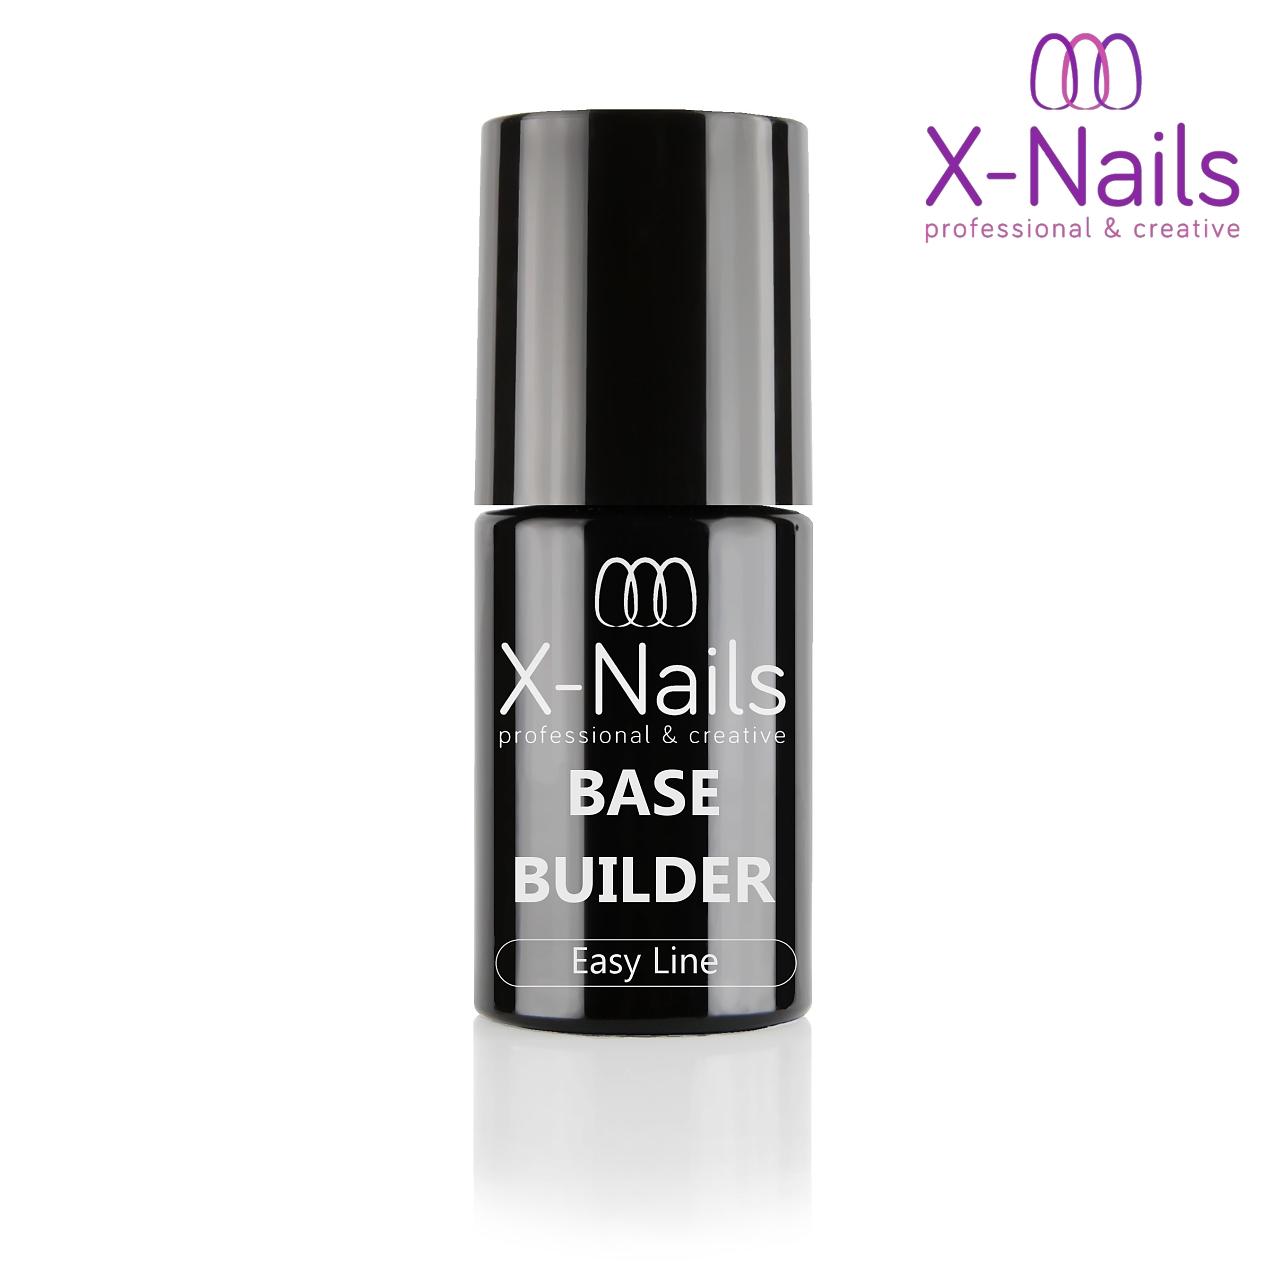 X Nails Podkladova Baze Pod Gel Laky Zpevnujici Podlak 6 Ml Base Builder X Nails Gelove Akrylove Nehty